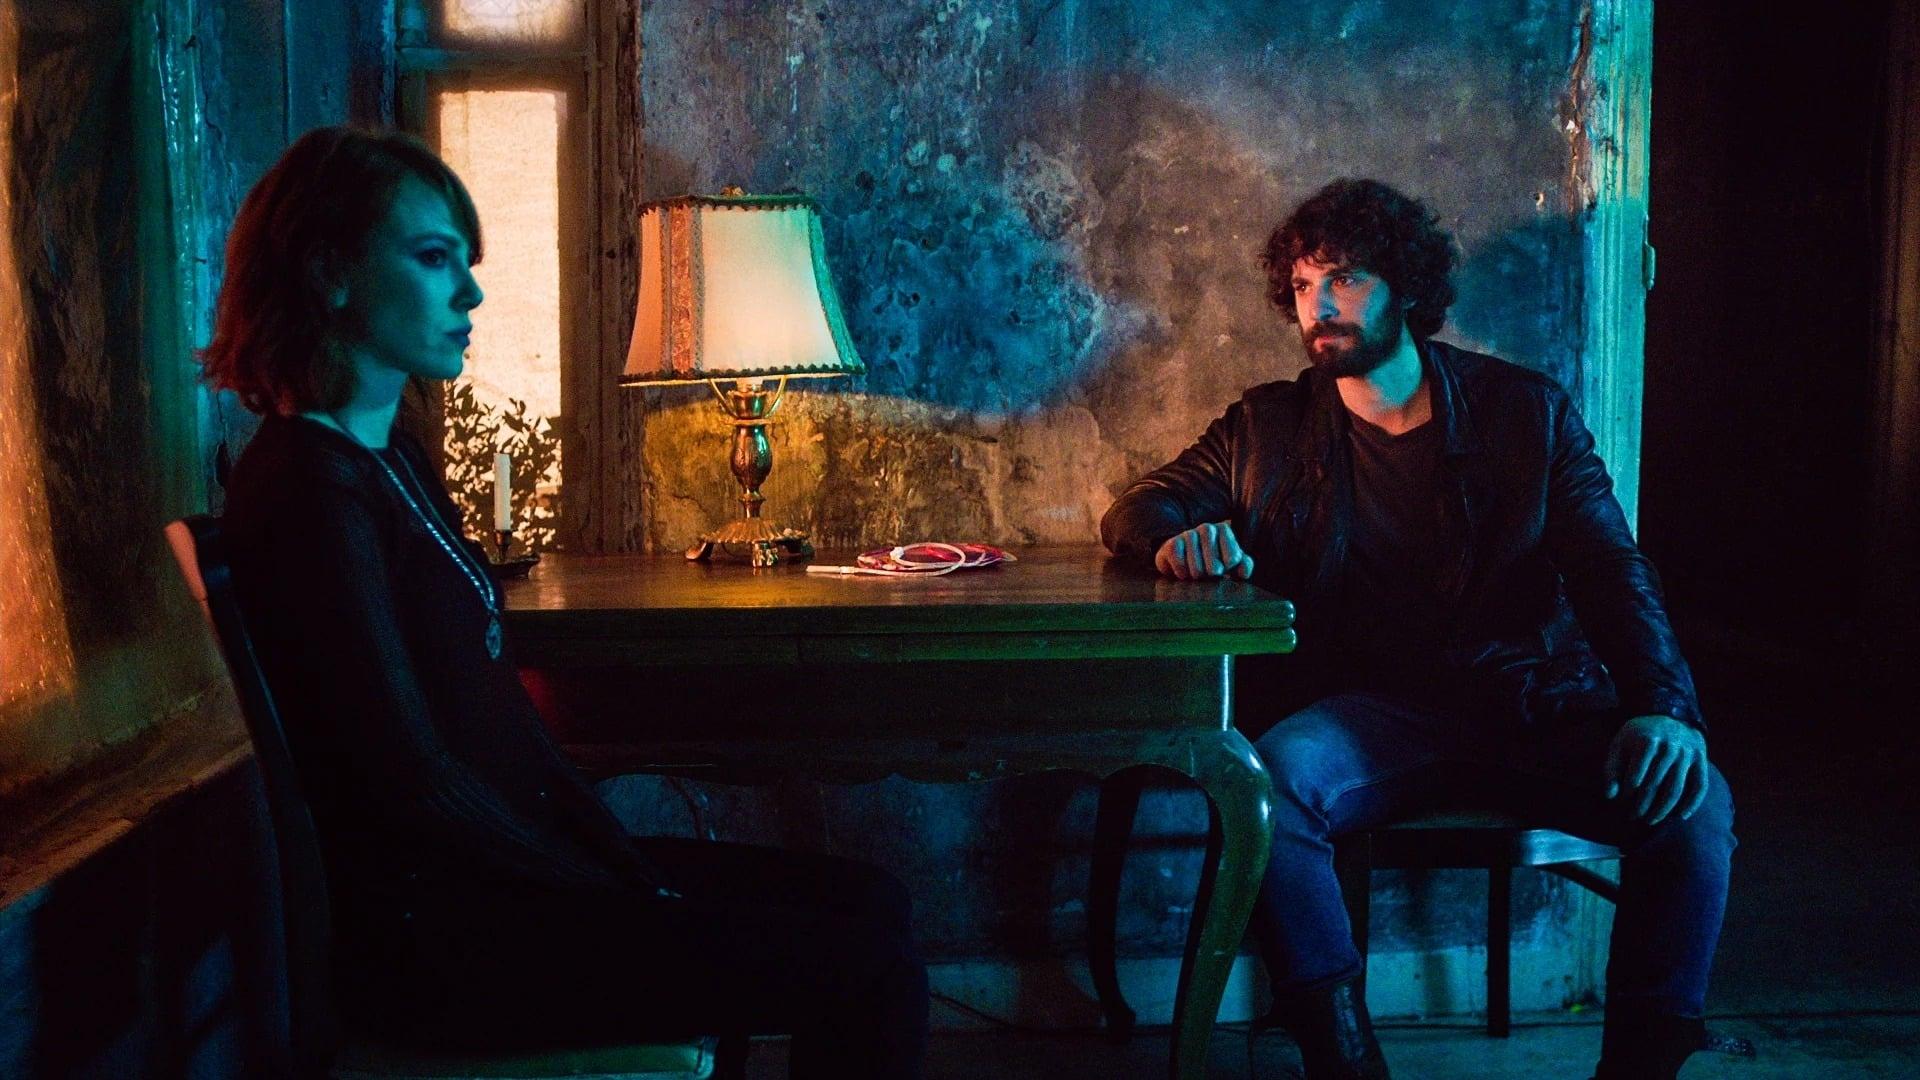 Le vampire d'Istanbul Season 1 Episode 4